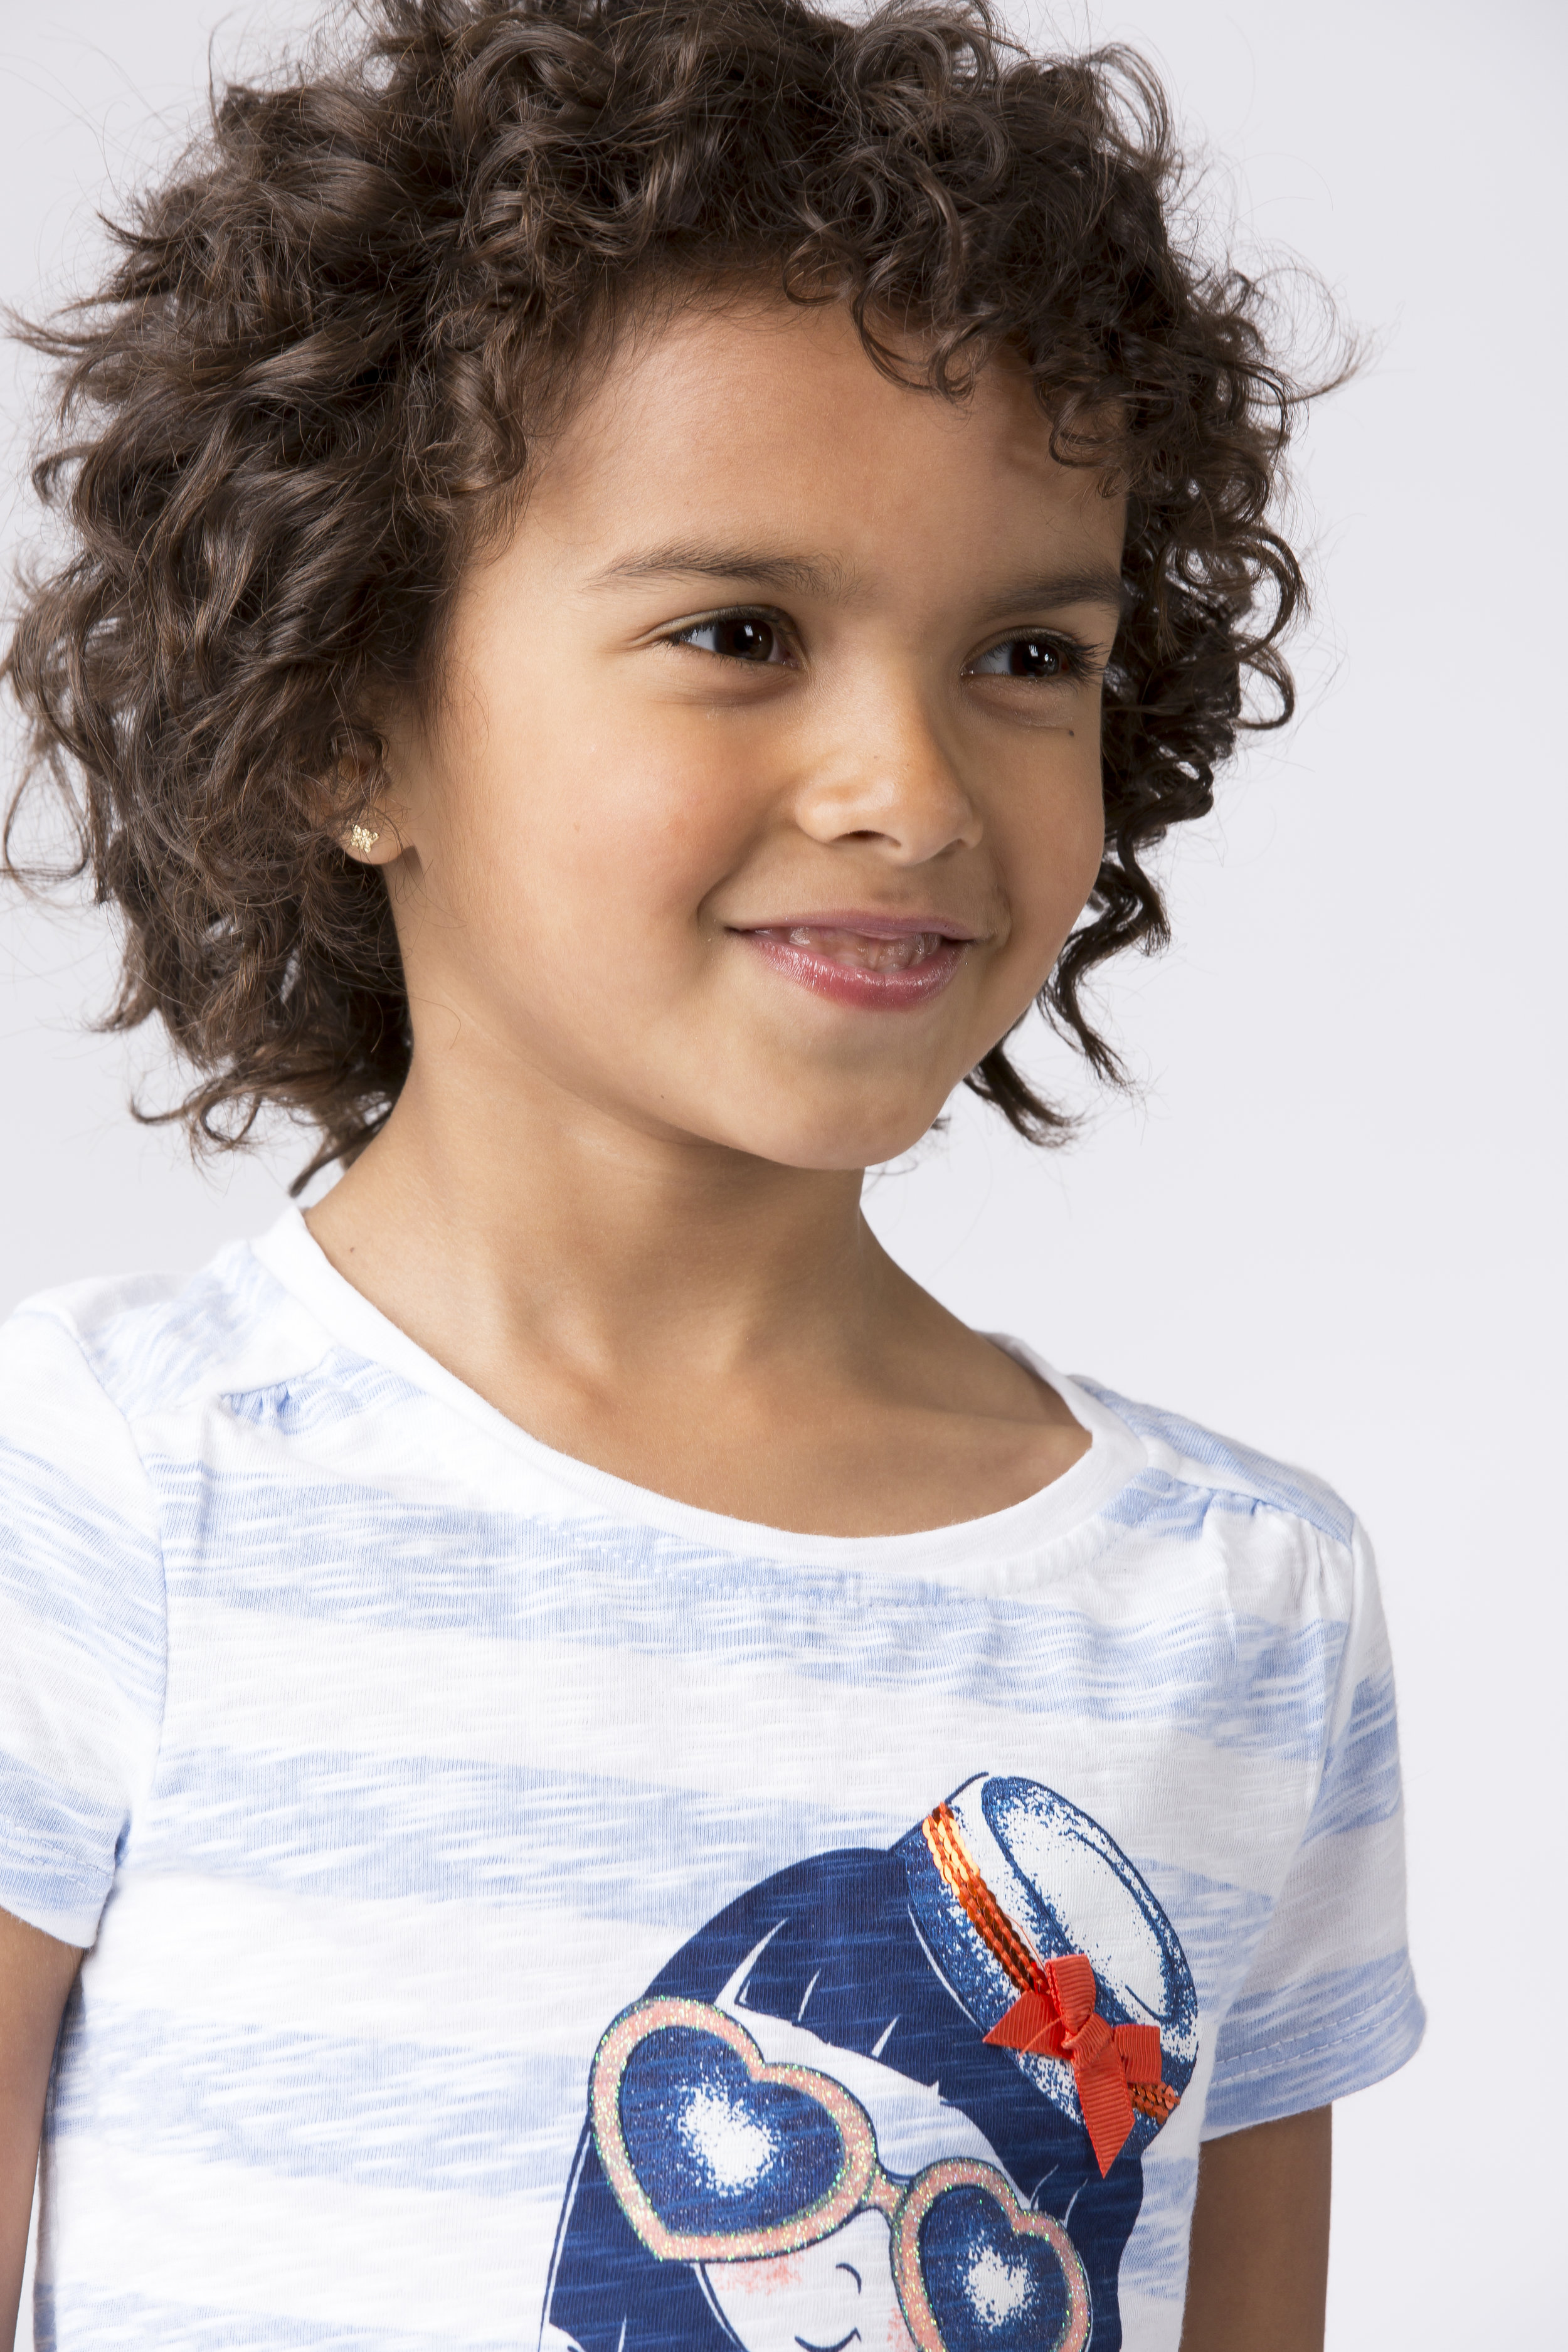 child-modeling-photography-portfolio-portland-or-vancouver-wa-MA2